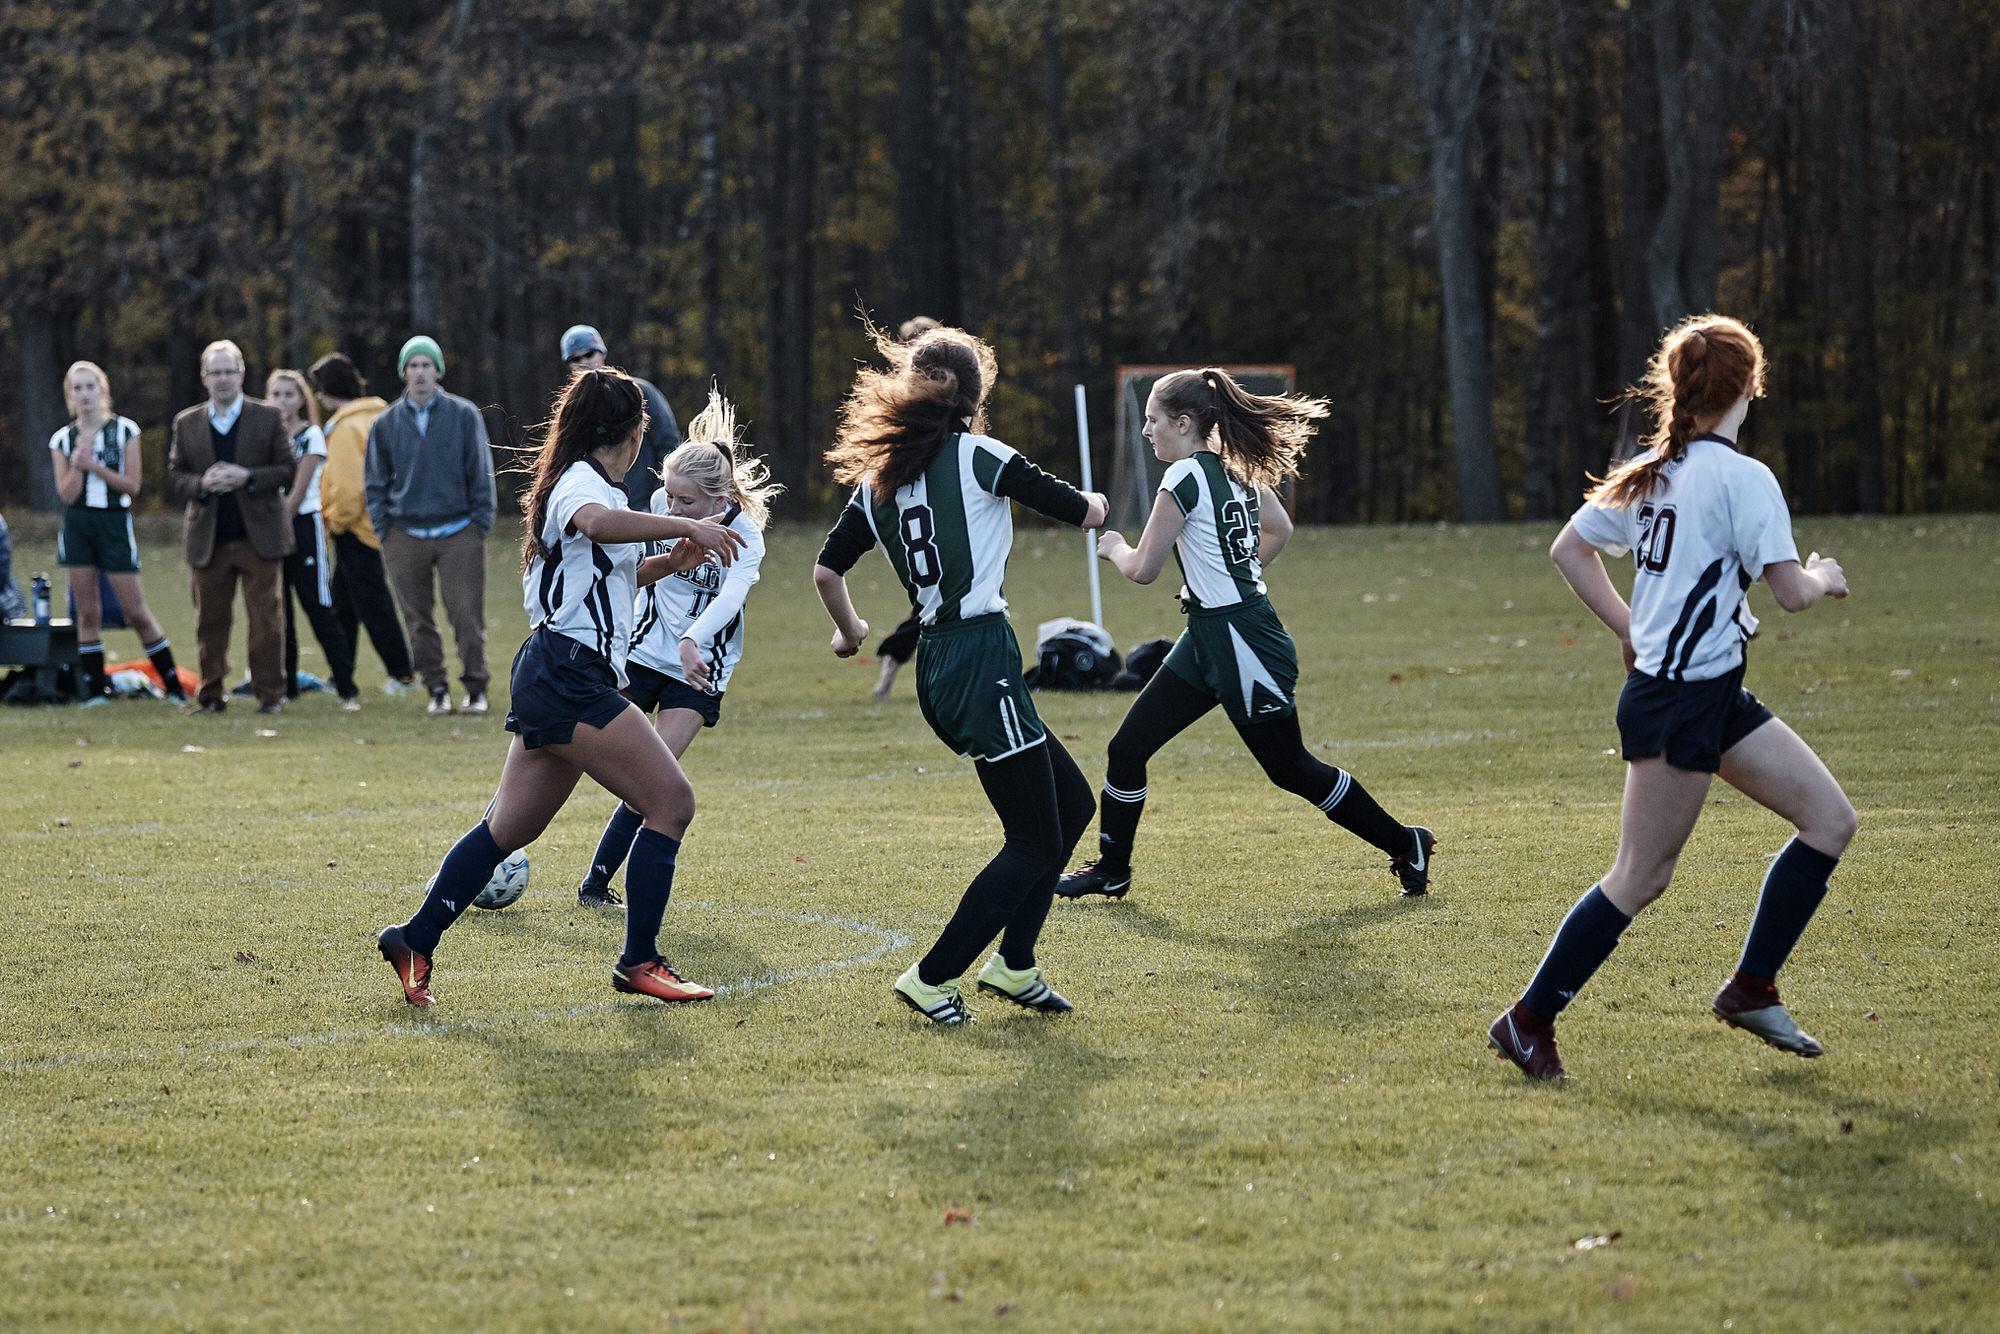 Girls Varsity Soccer vs. Putney School - October 26, 2018 - 046.jpg